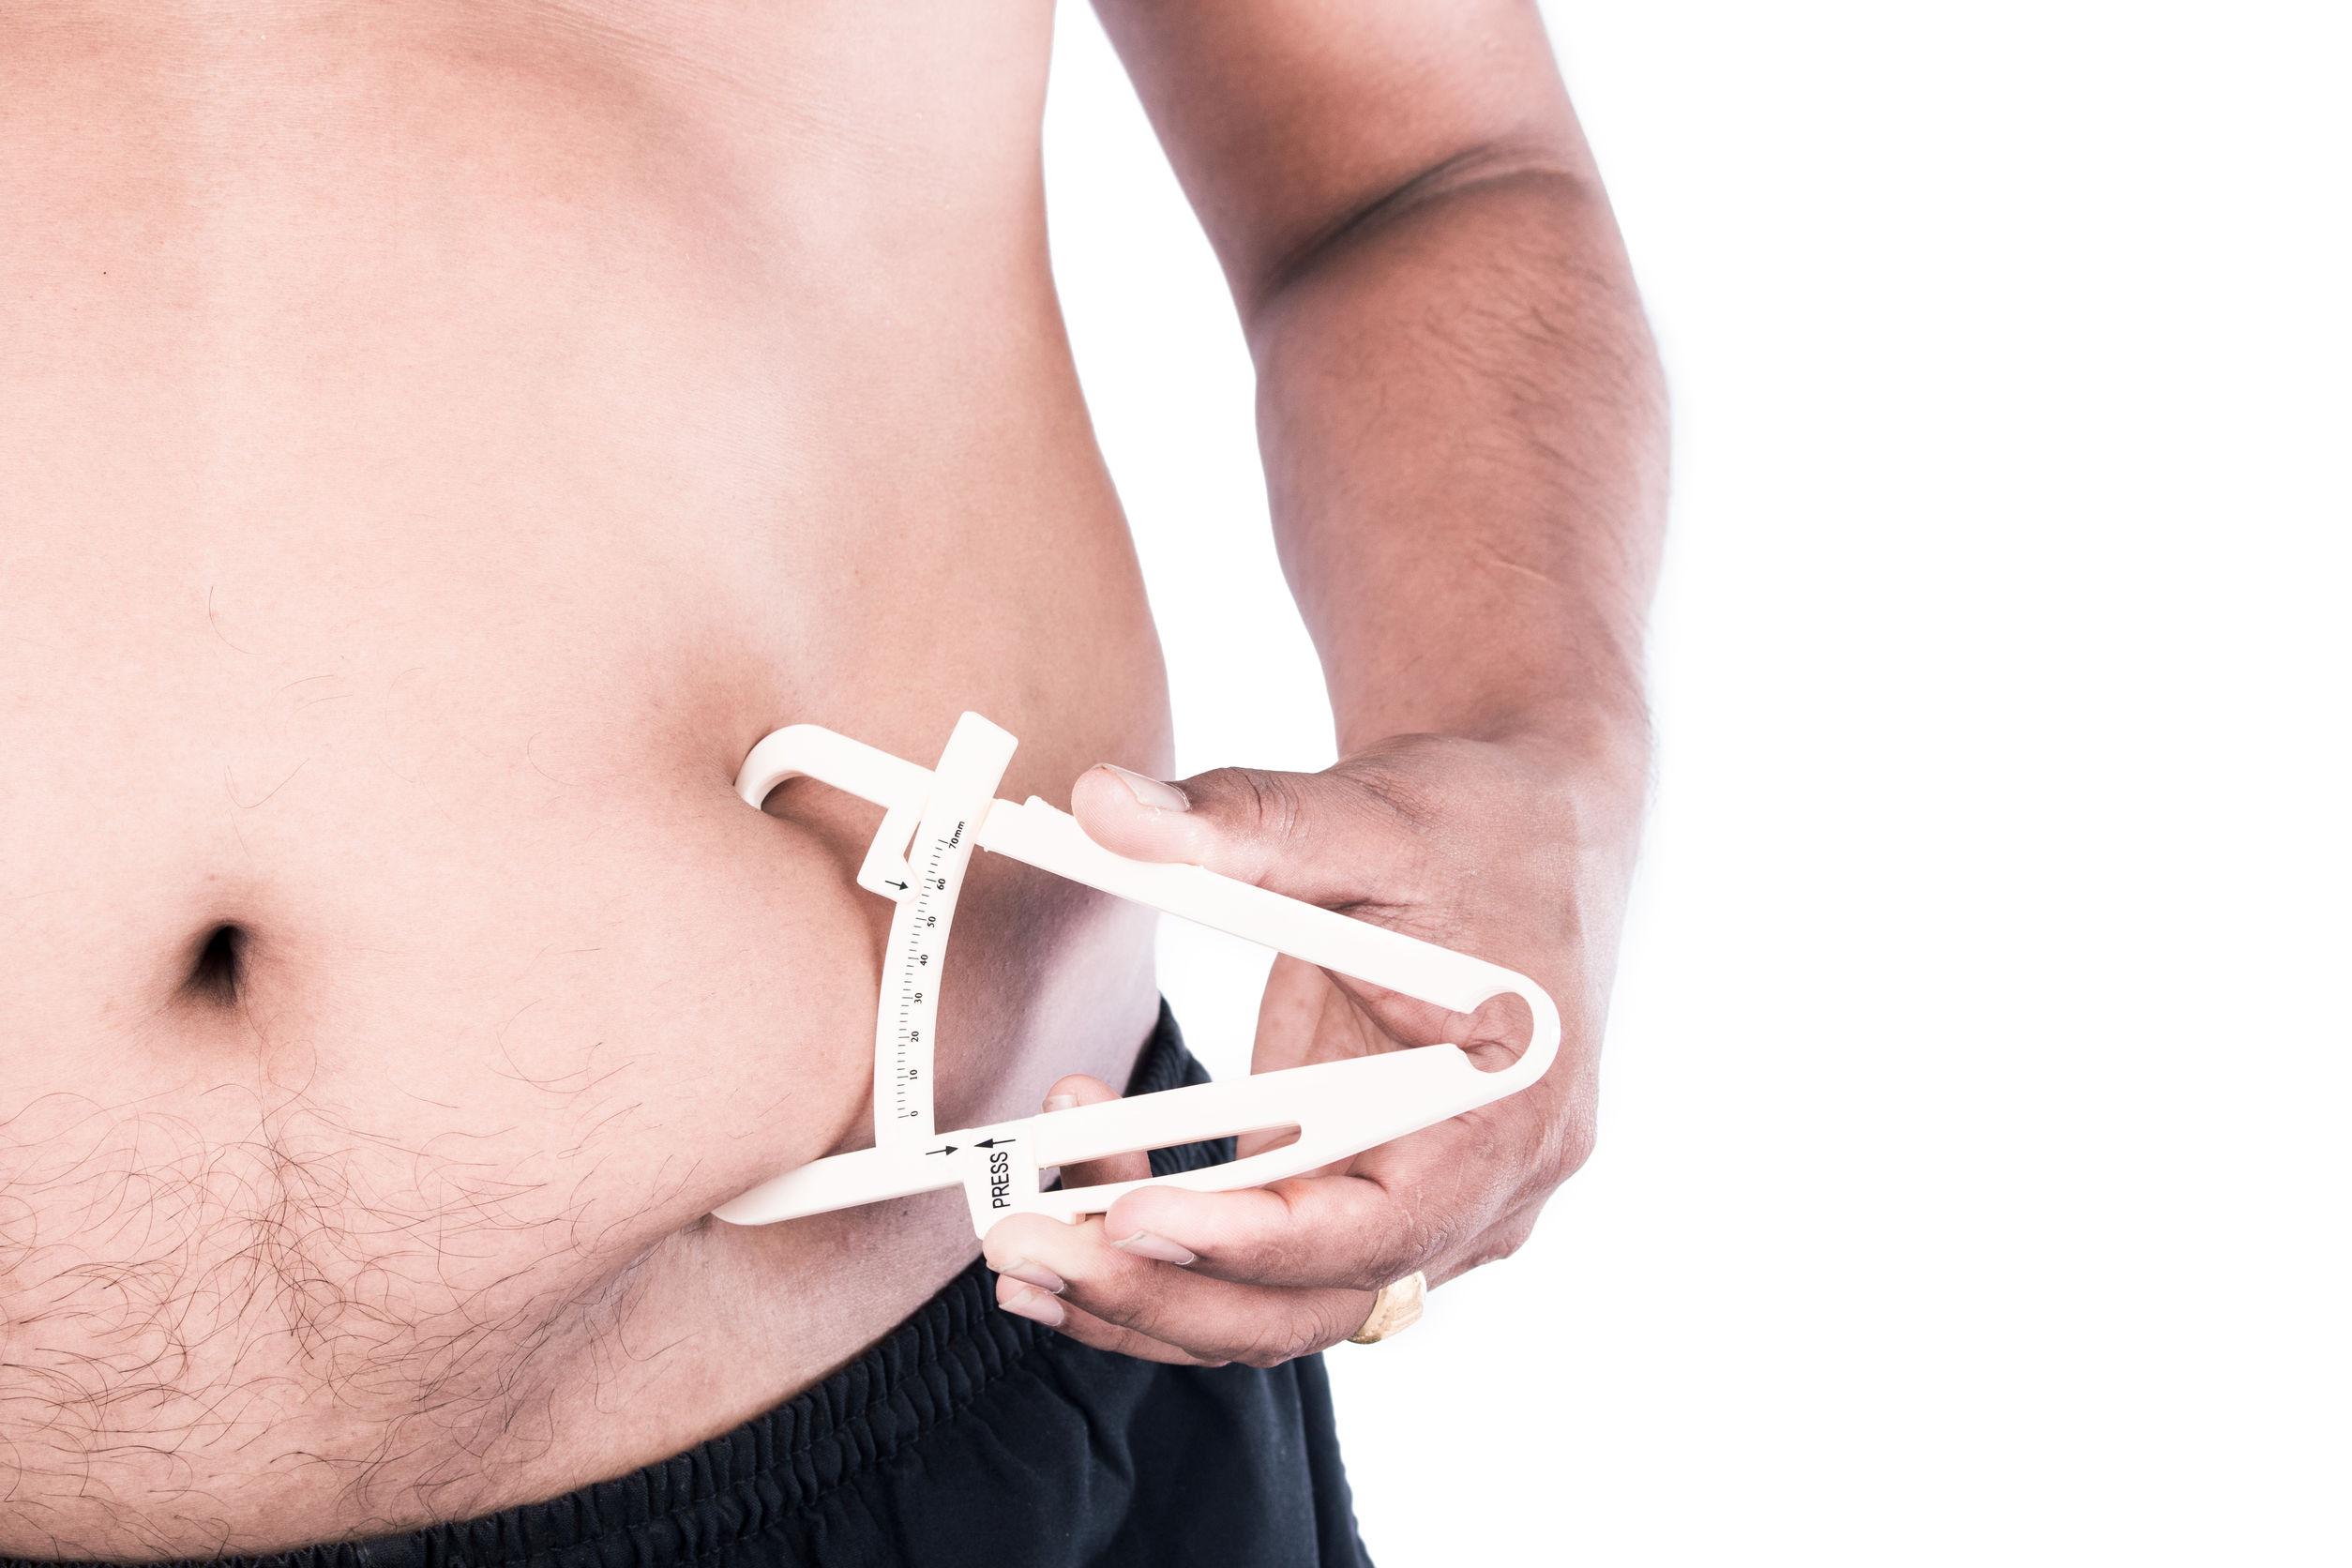 skinny fat man belly gay fitness